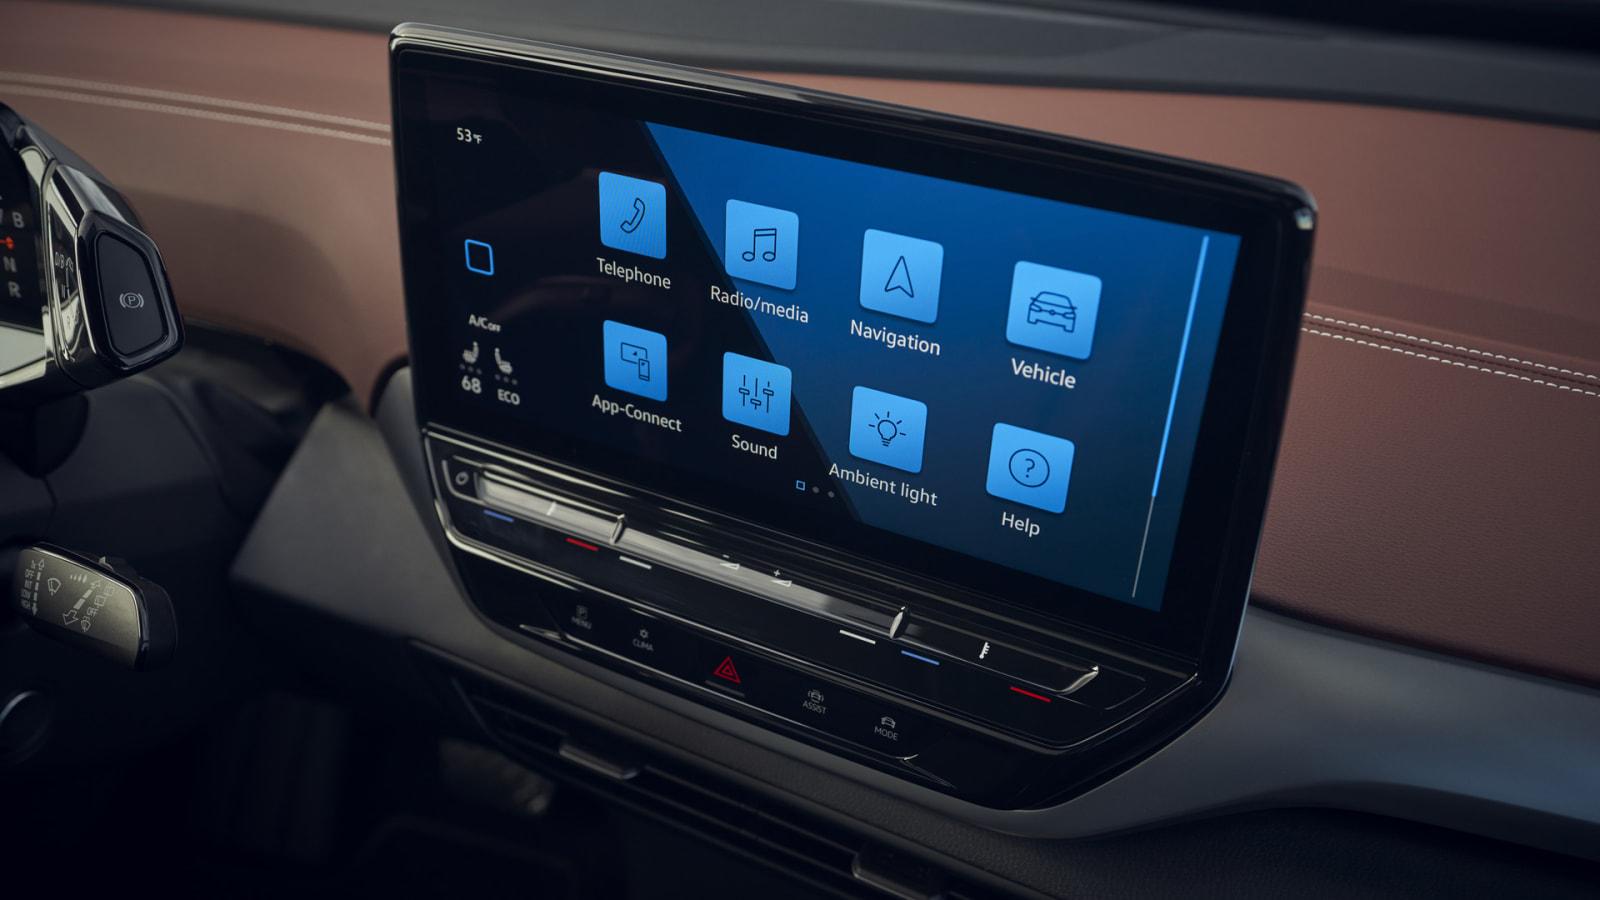 VW ID4 touchscreen